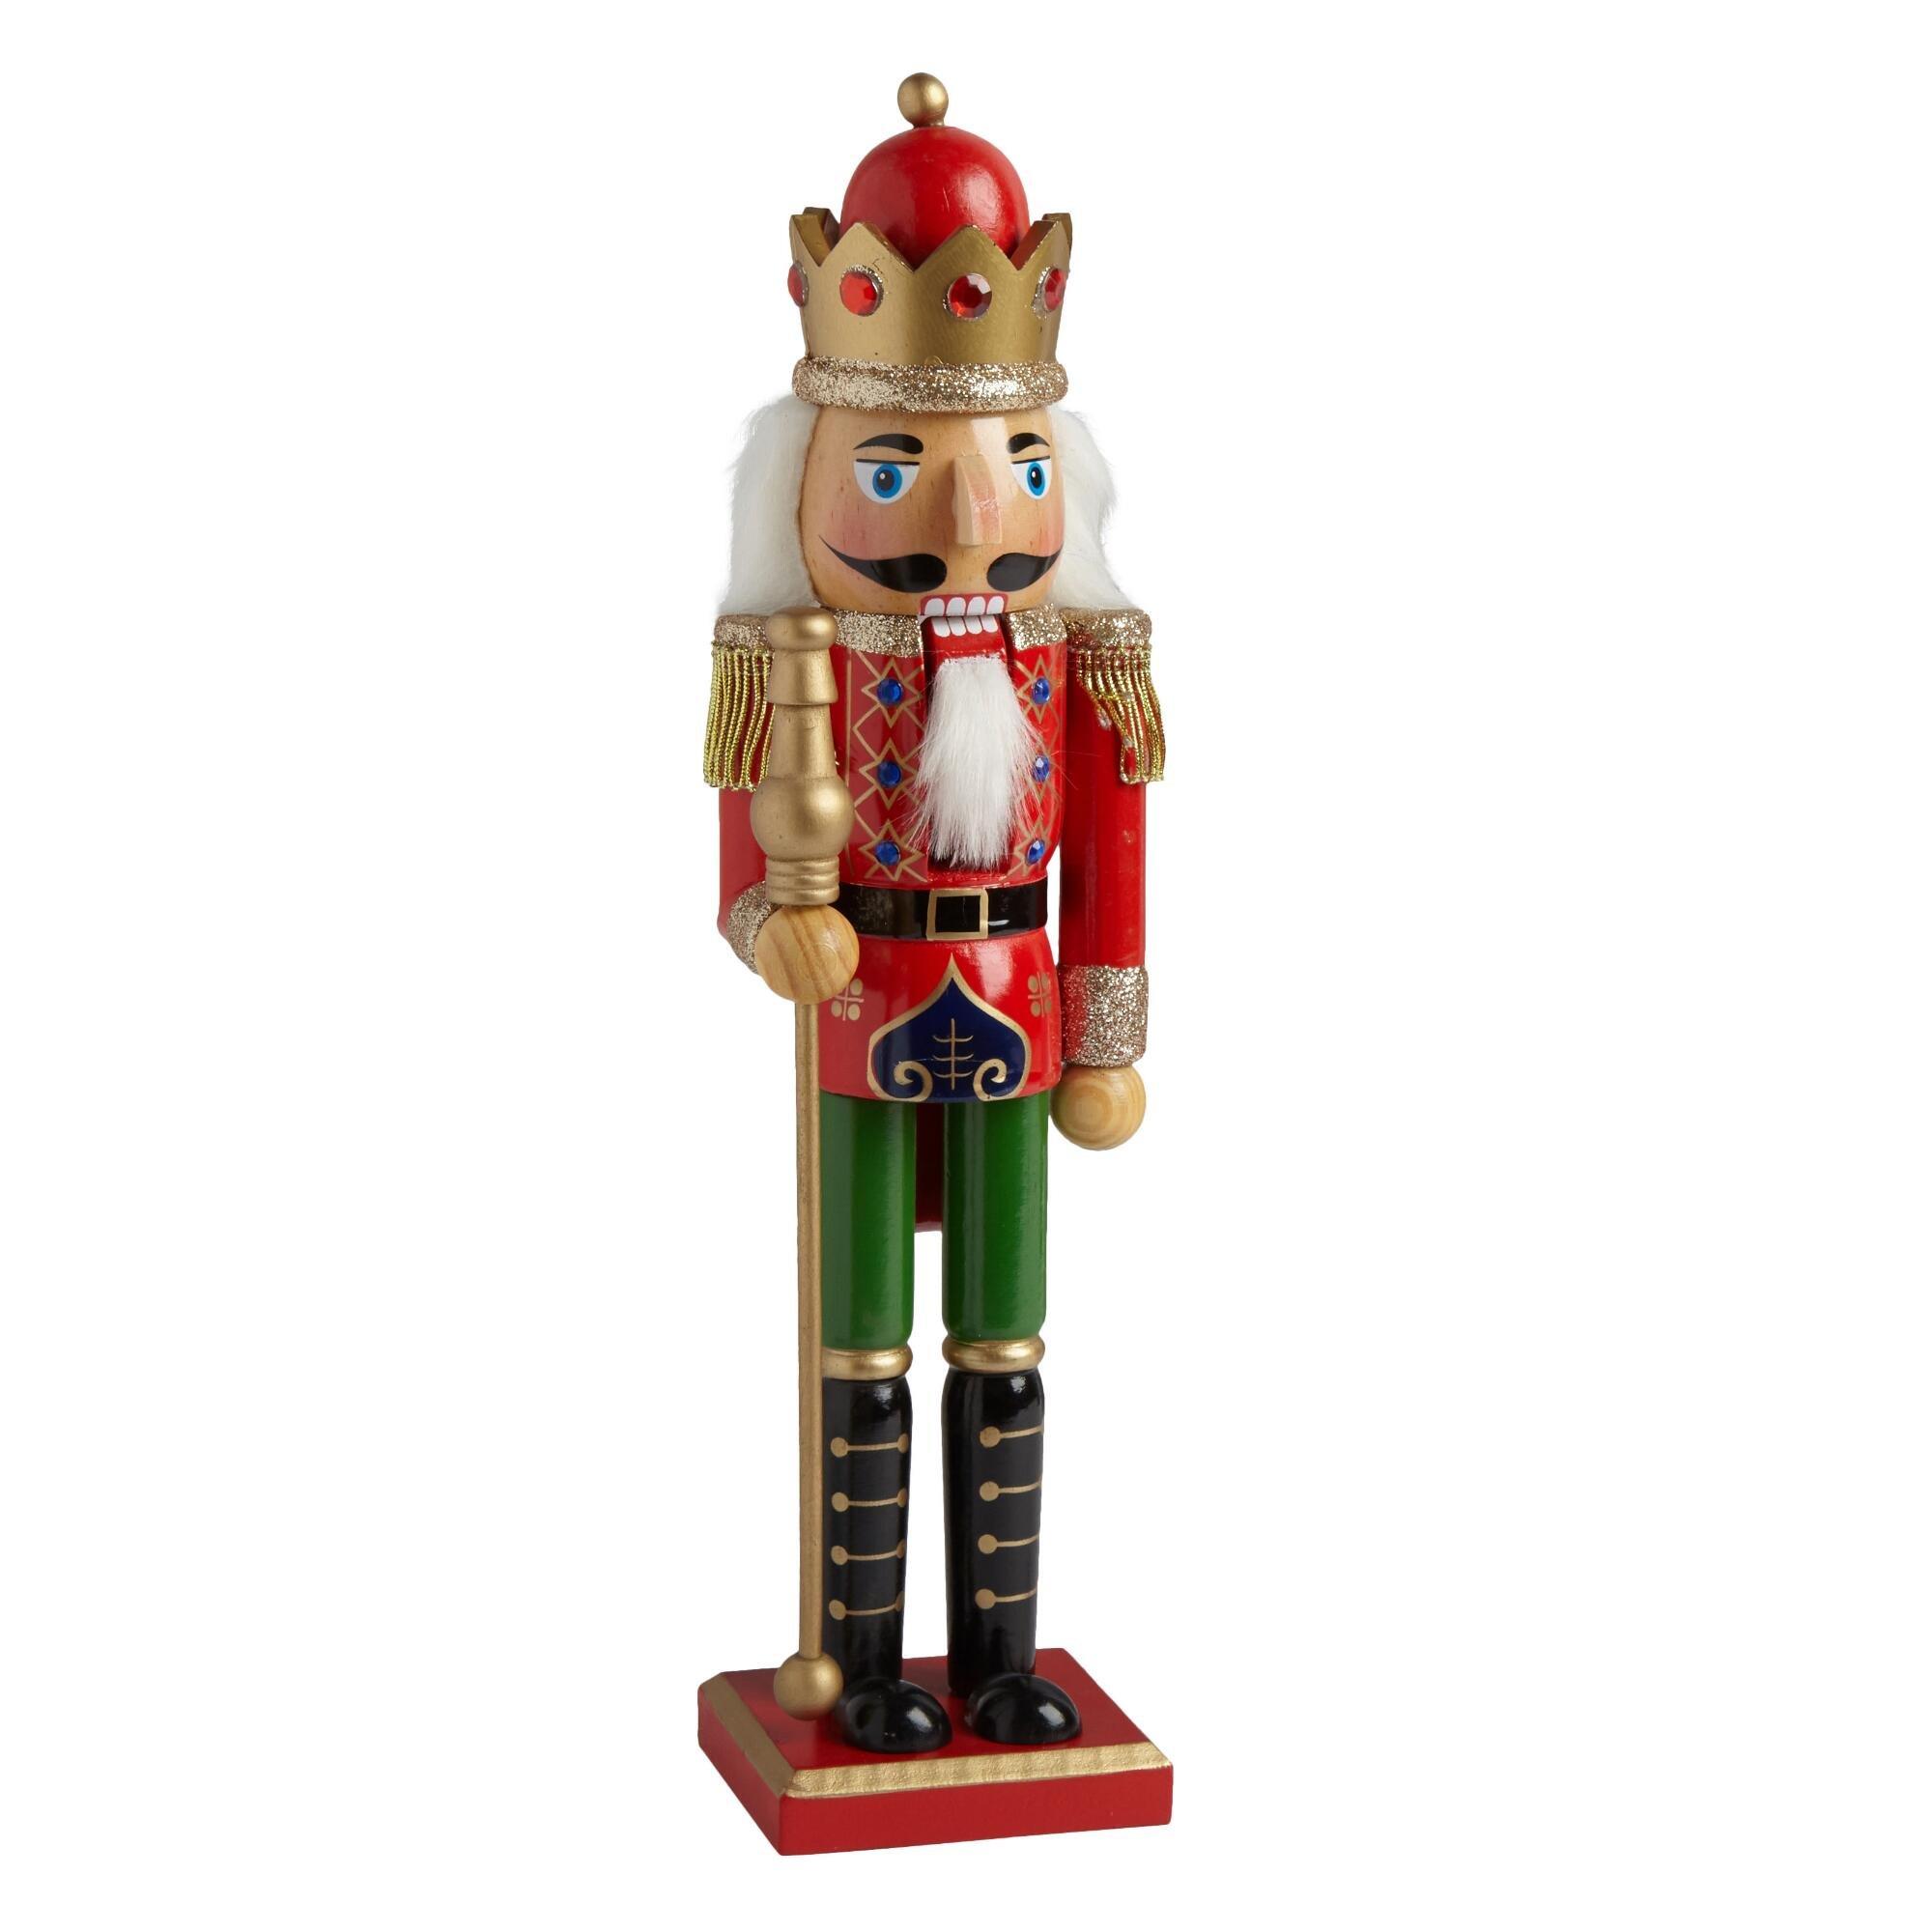 Nantucket Home Wooden Christmas Nutcracker Decor, 15-Inch, Red Uniform King